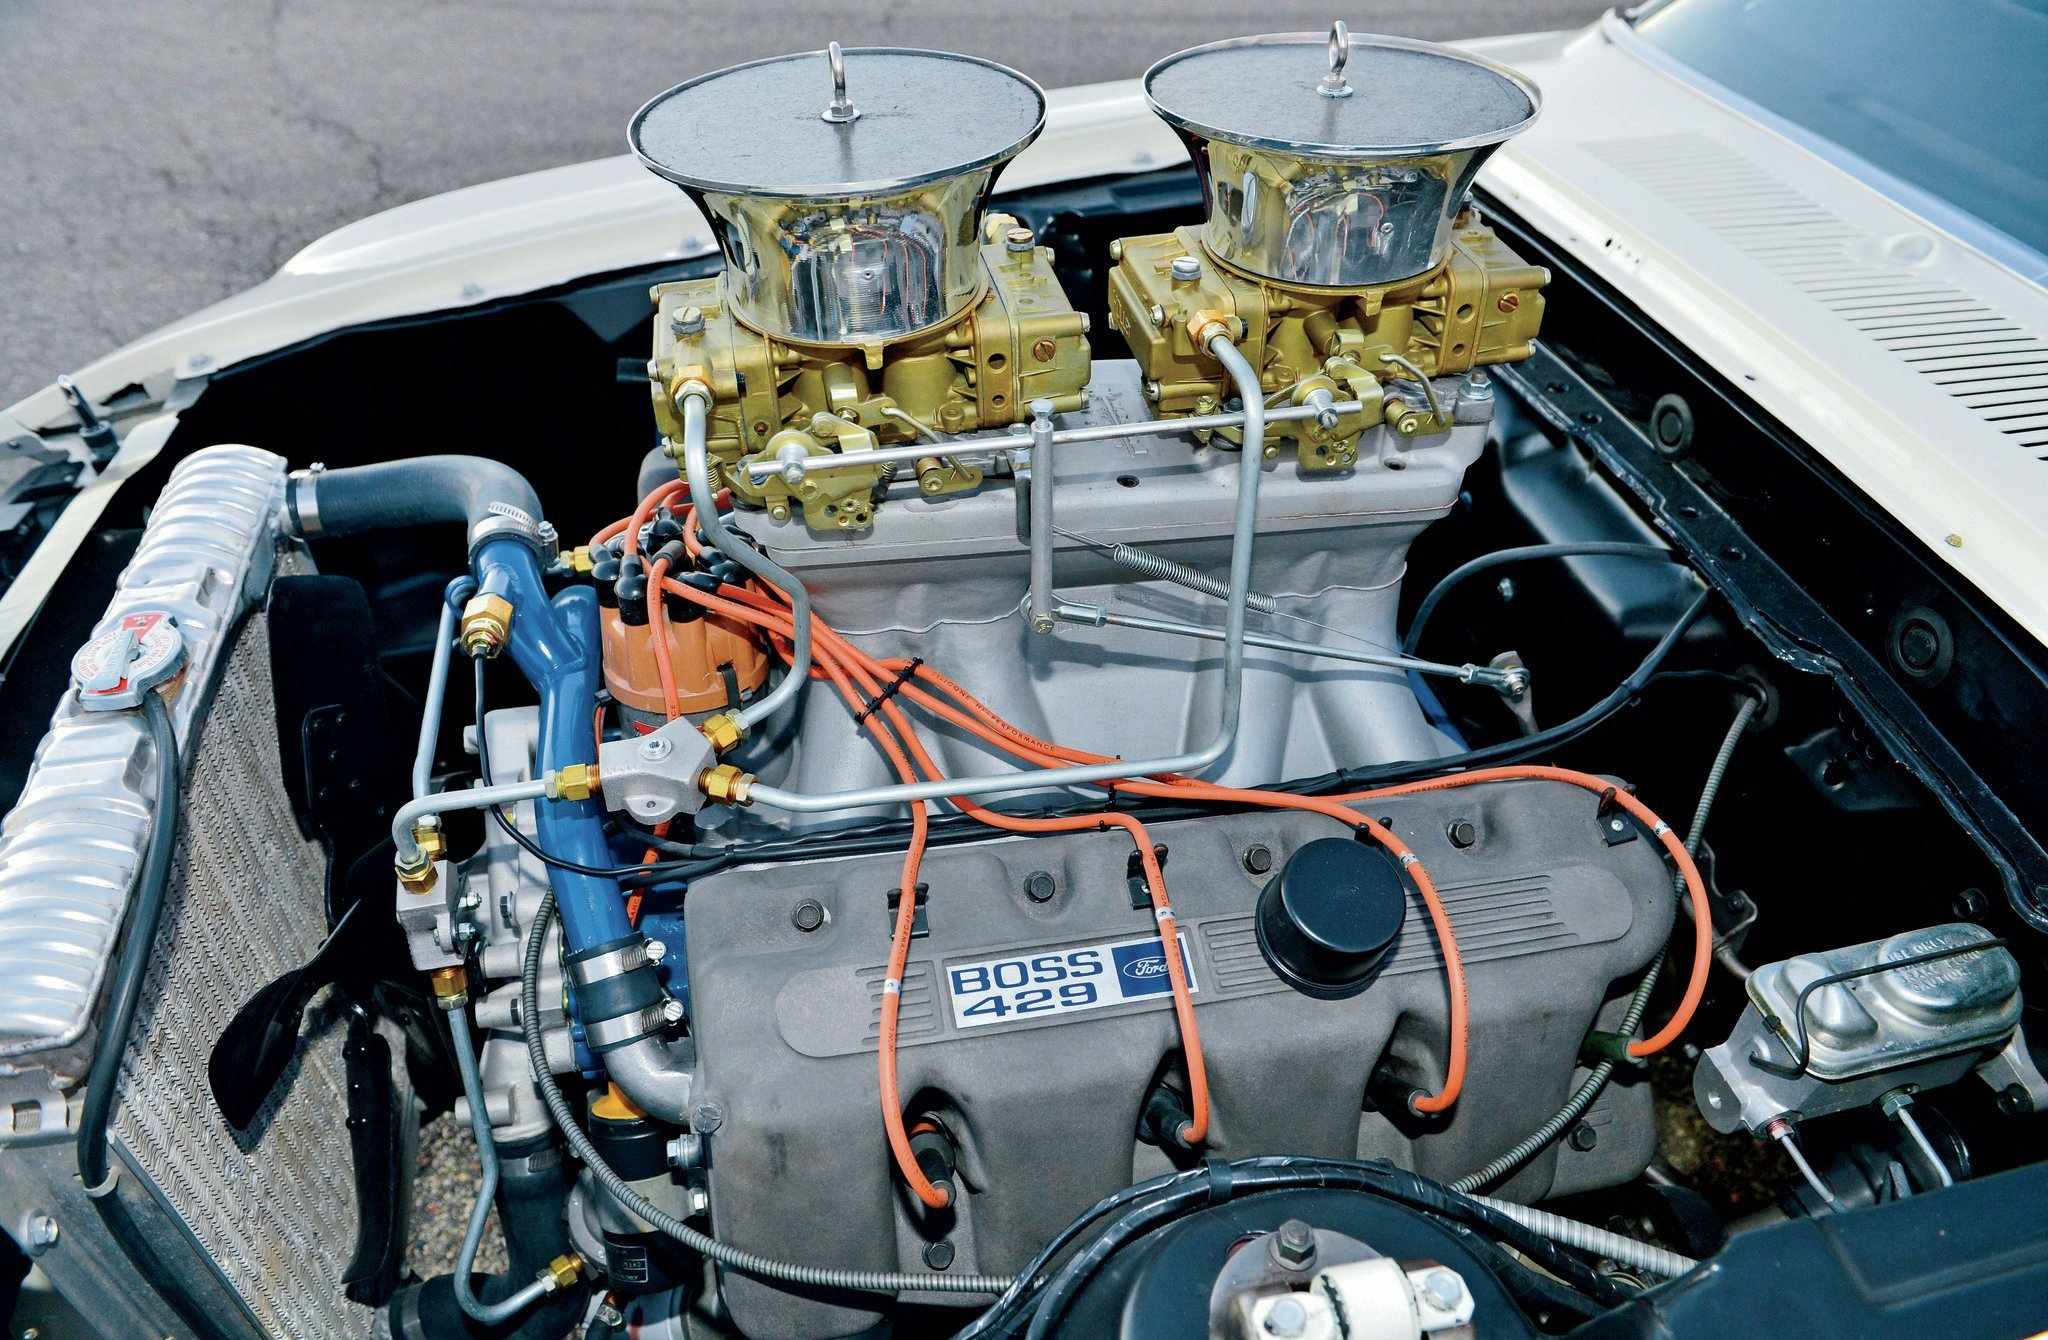 1969 Ford Mustang Boss 429 Pro Stock Drag Dragster Race